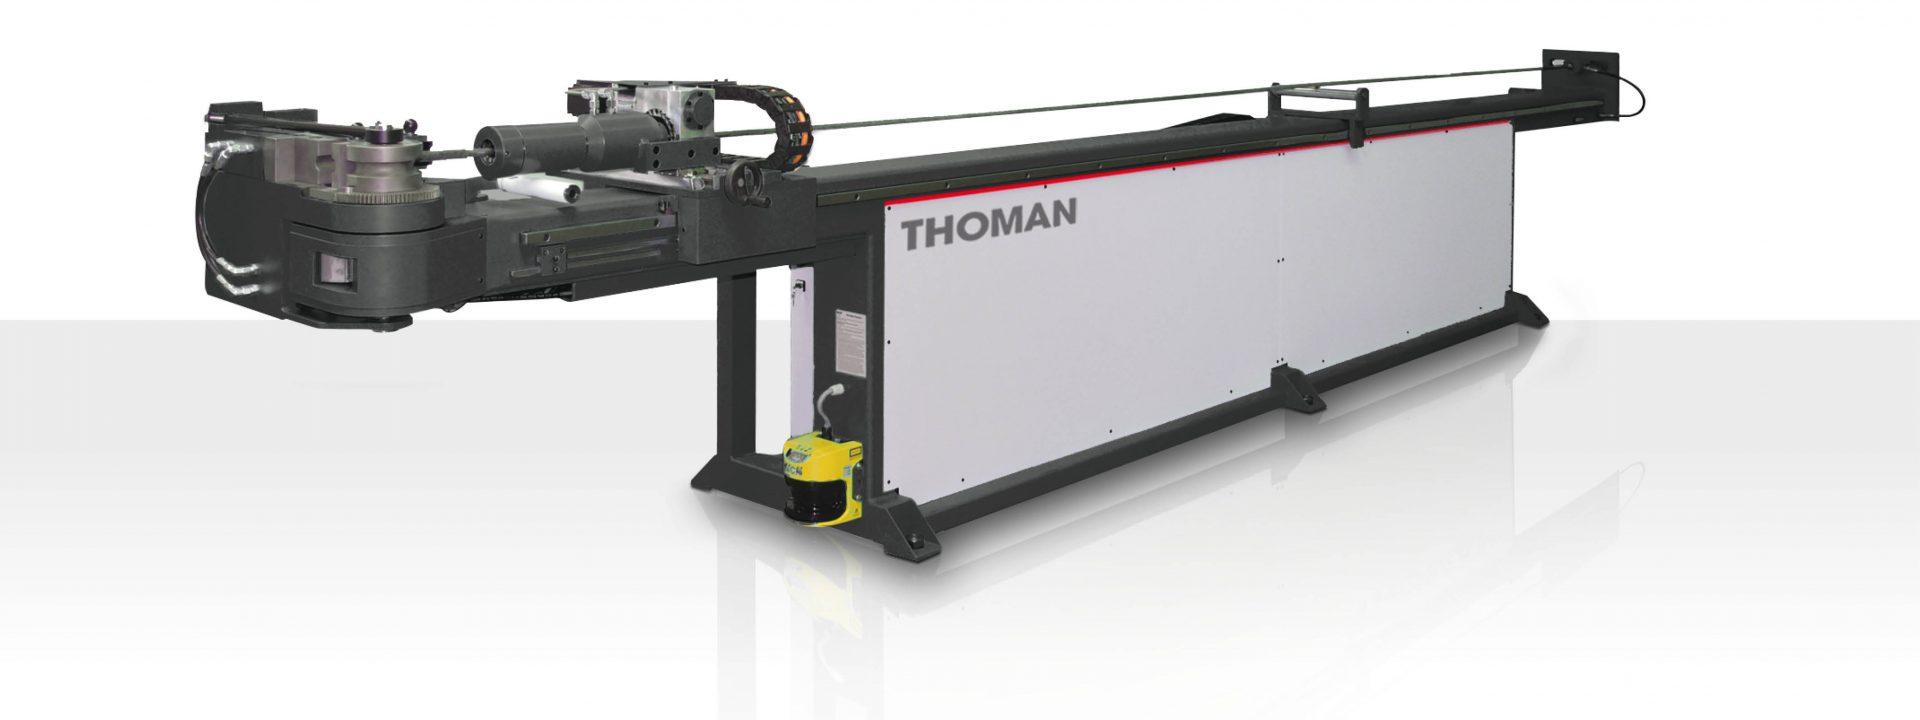 Rohrbiegemaschine - Rohrbiegen - vollautomatische NC Biegemaschine